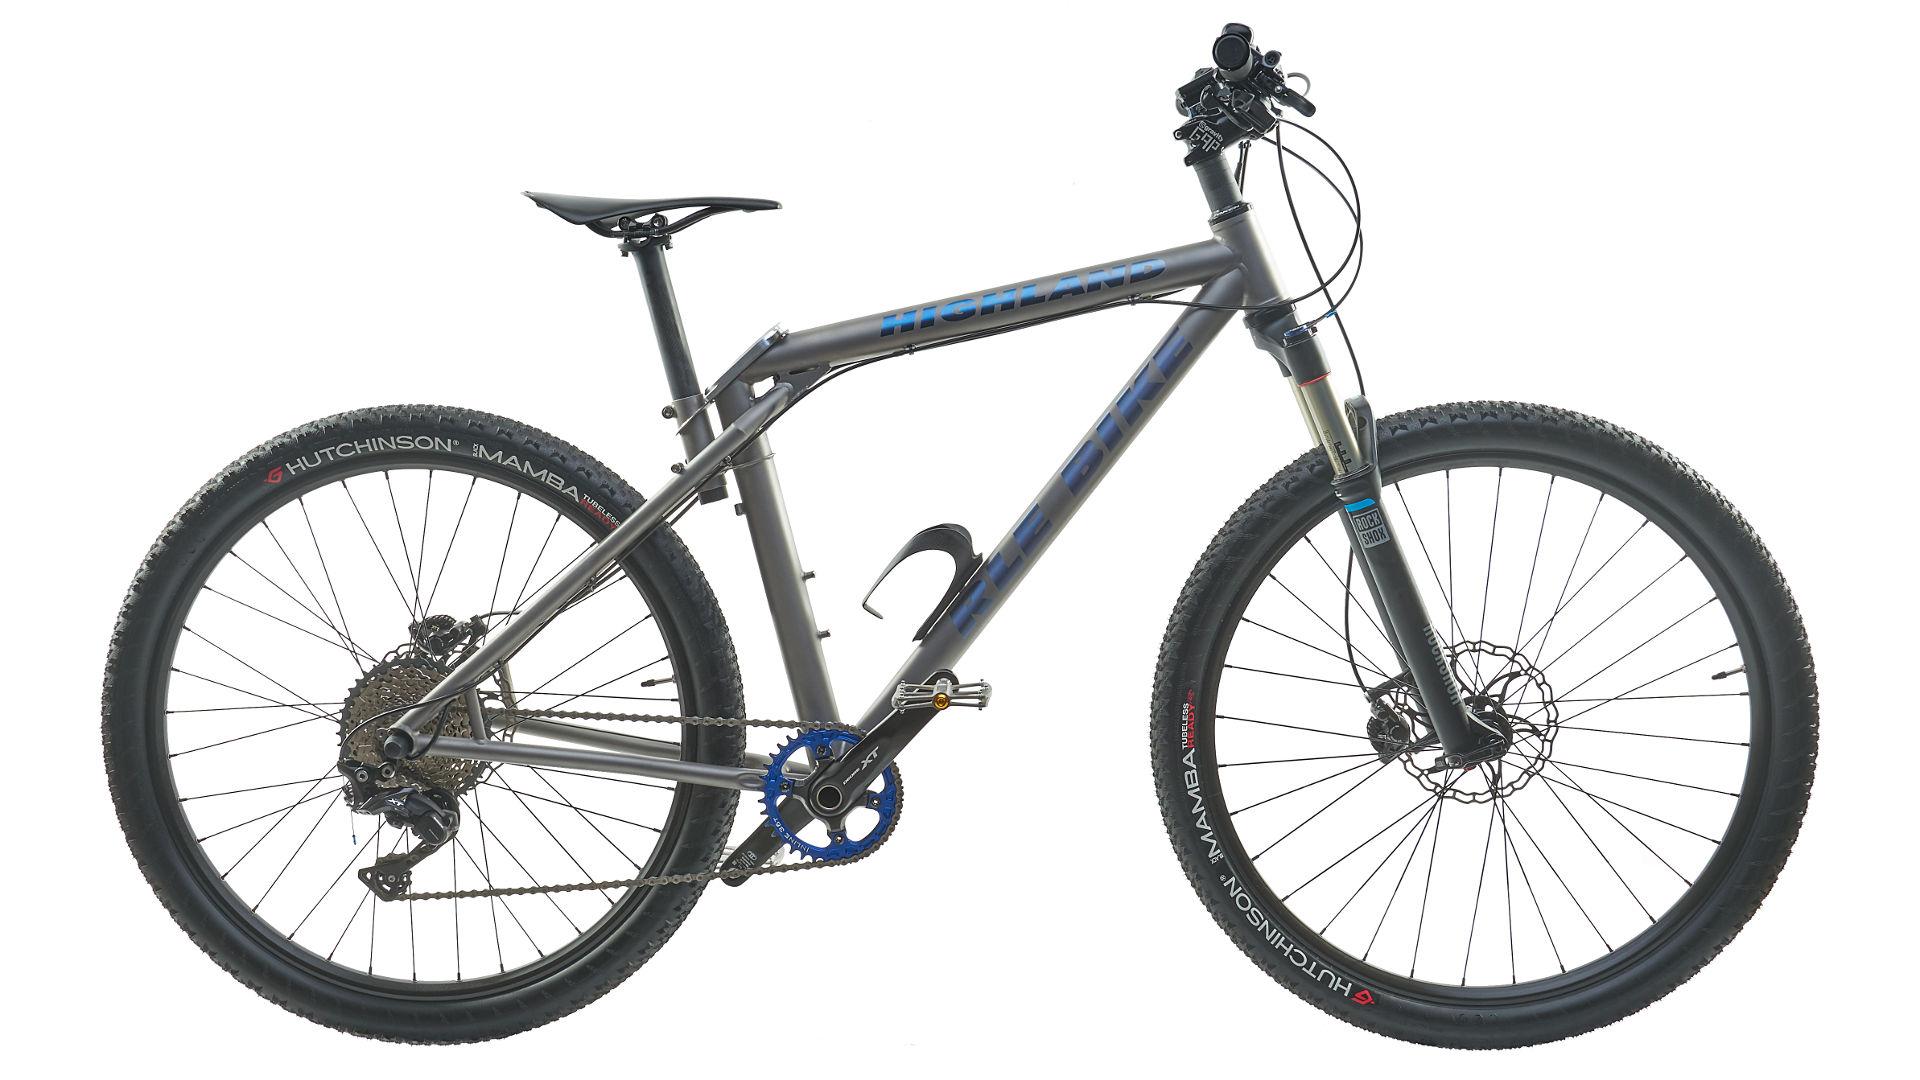 Neu: RLE Bike Highland – ultraleichtes Titan-E-Bike aus Russland ...